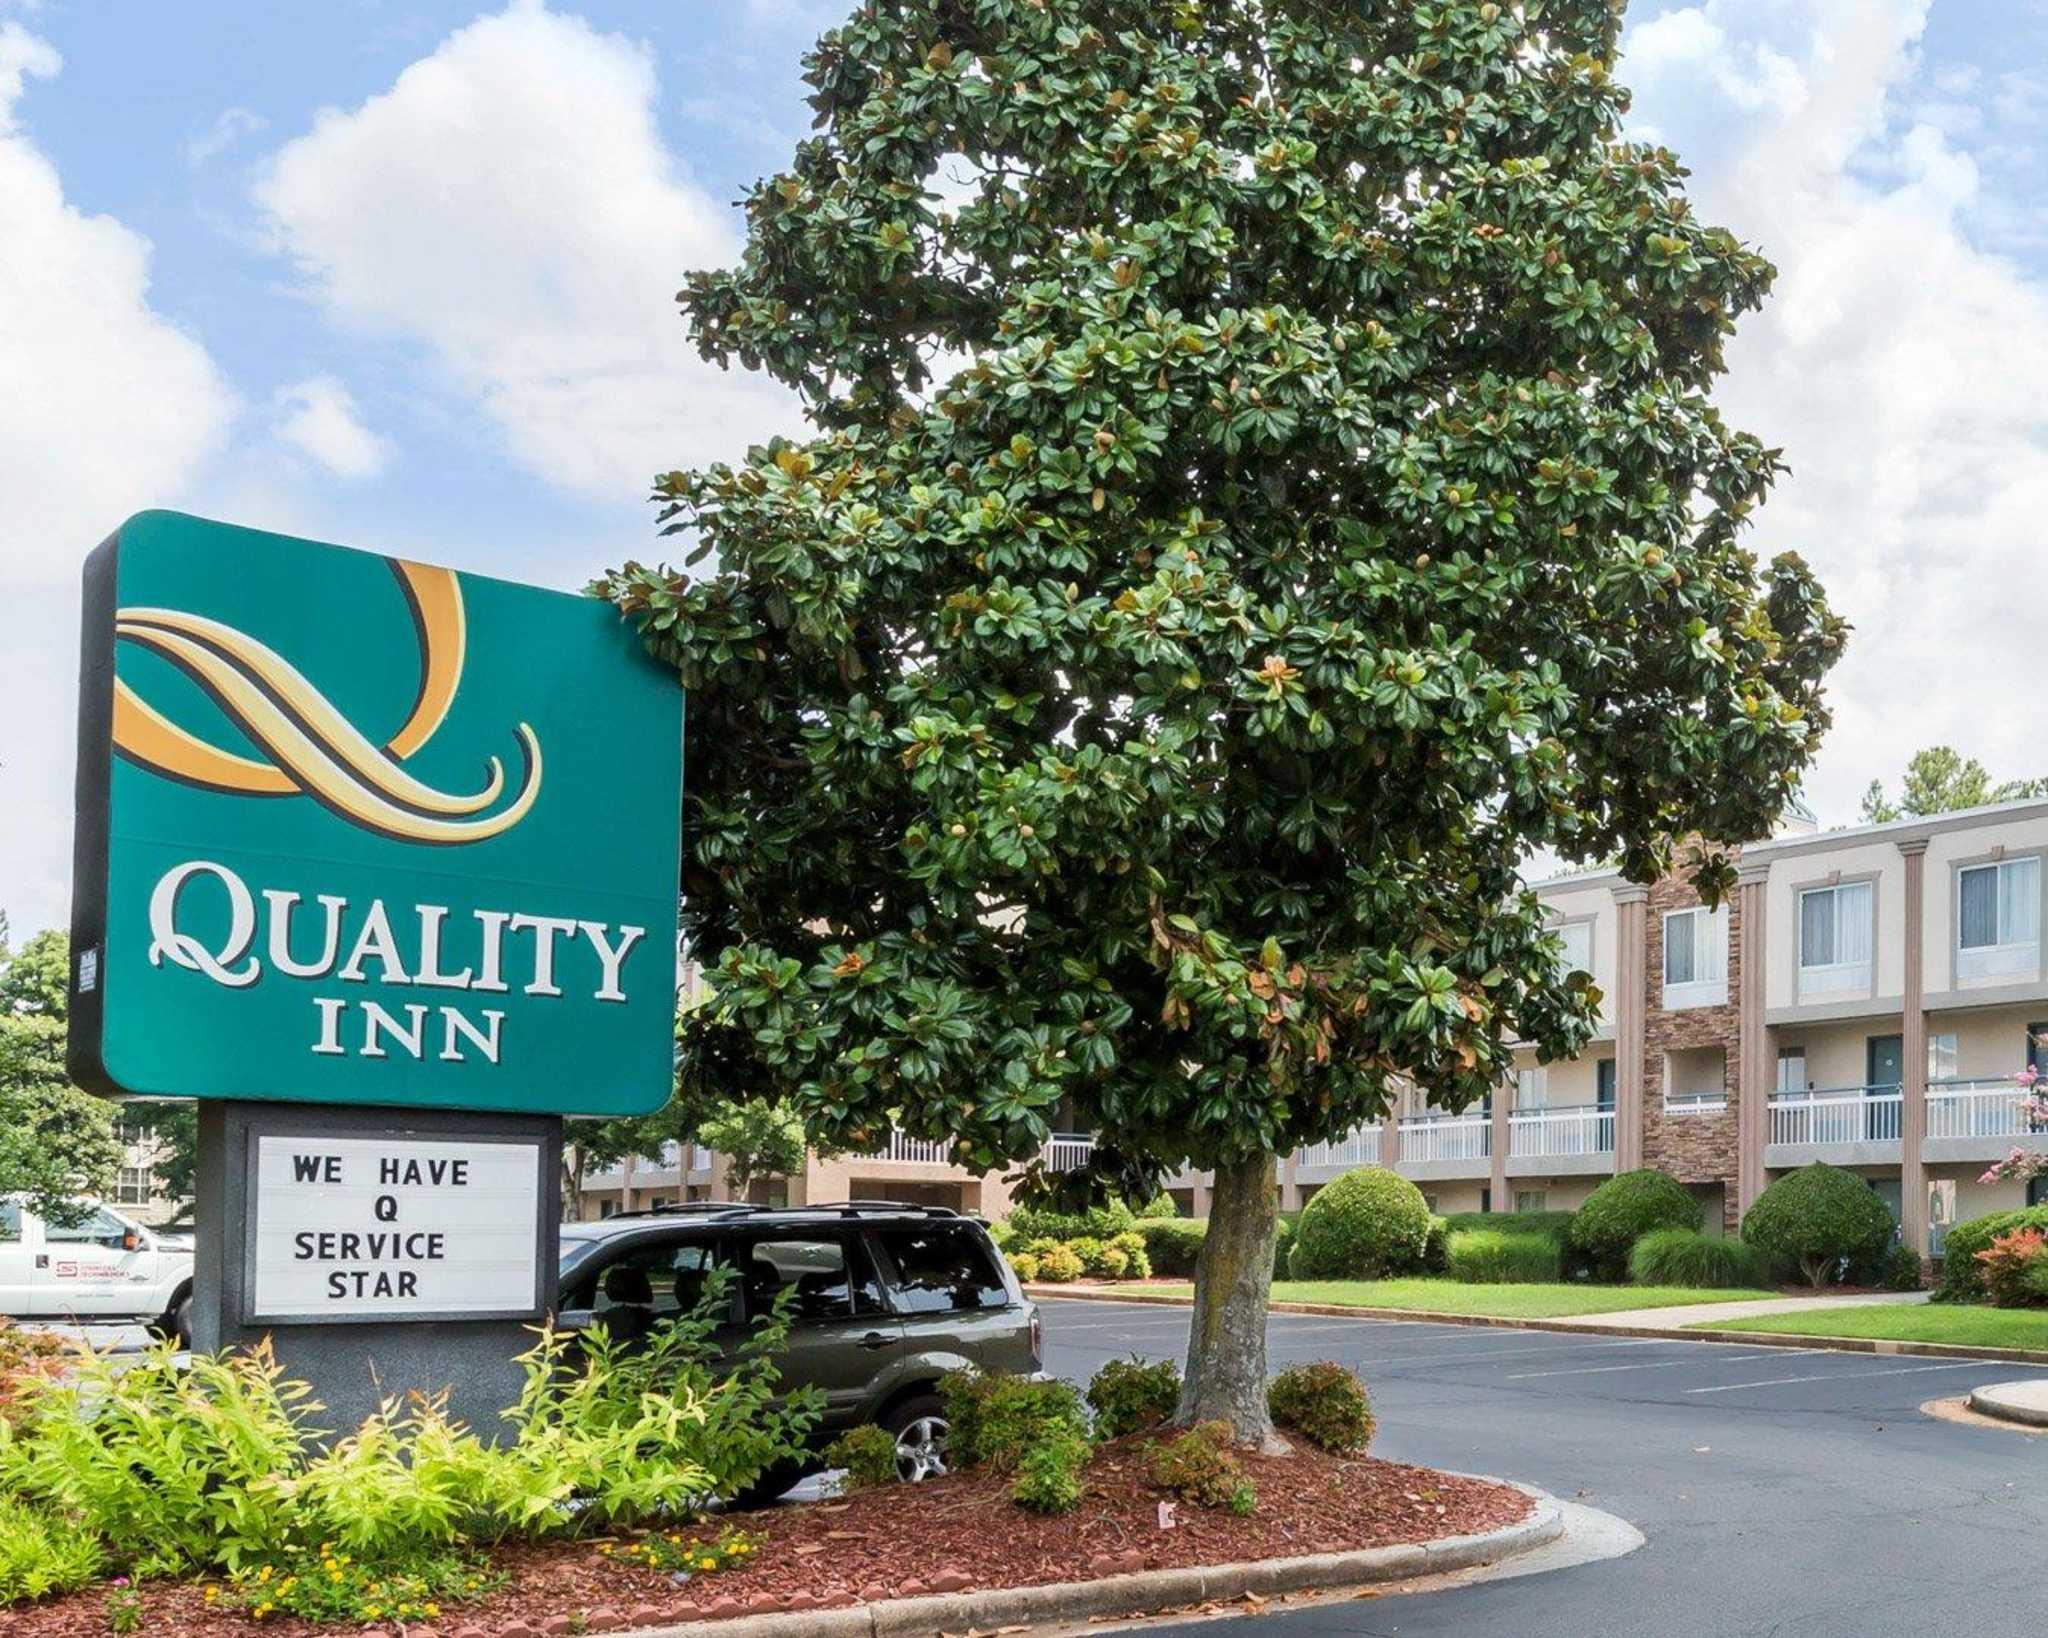 Quality Inn Northlake image 1